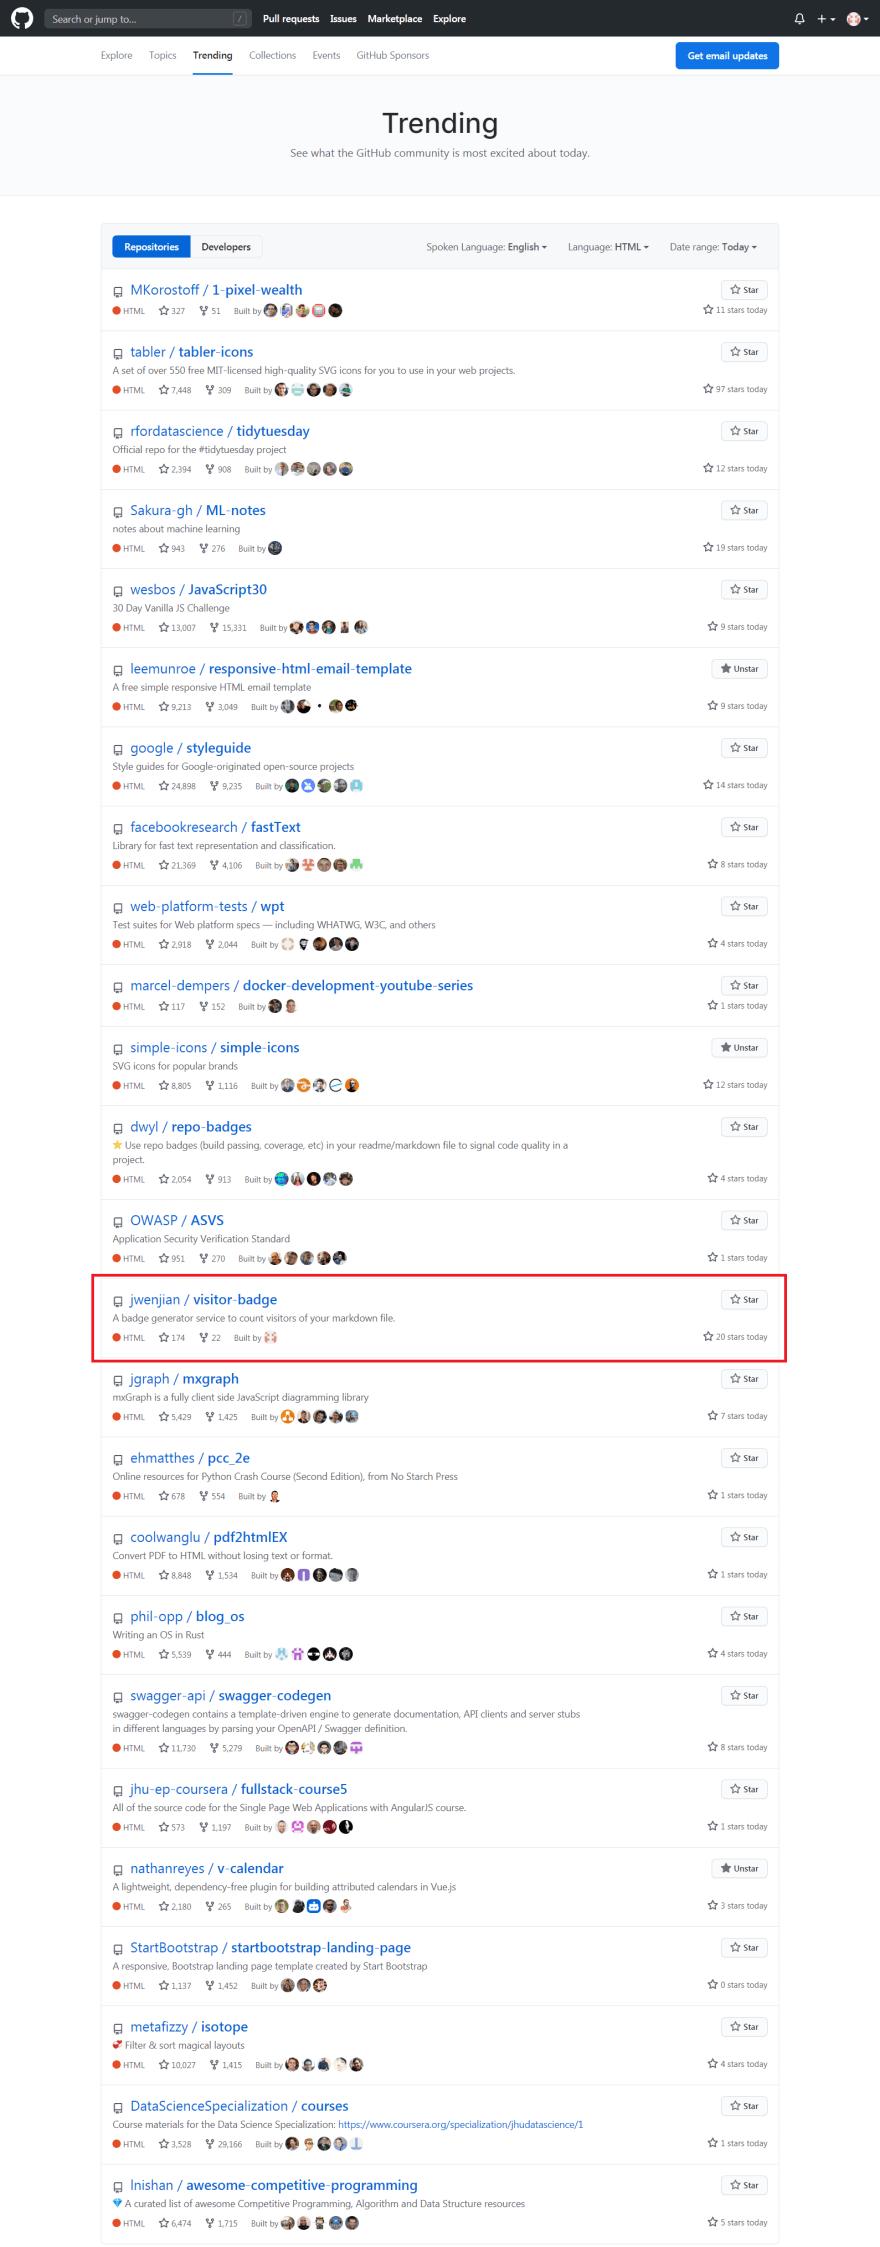 It's in GitHub Trending!